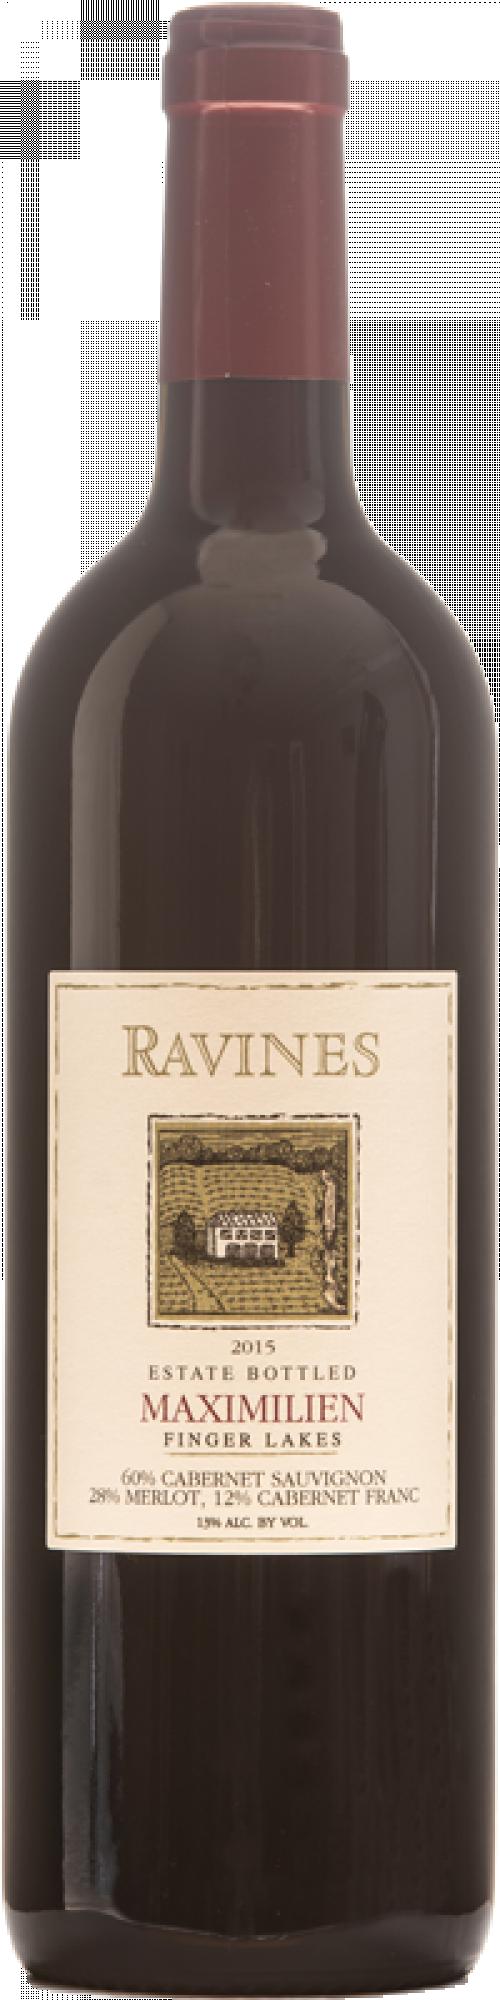 2017 Ravines Maximilien 750ml